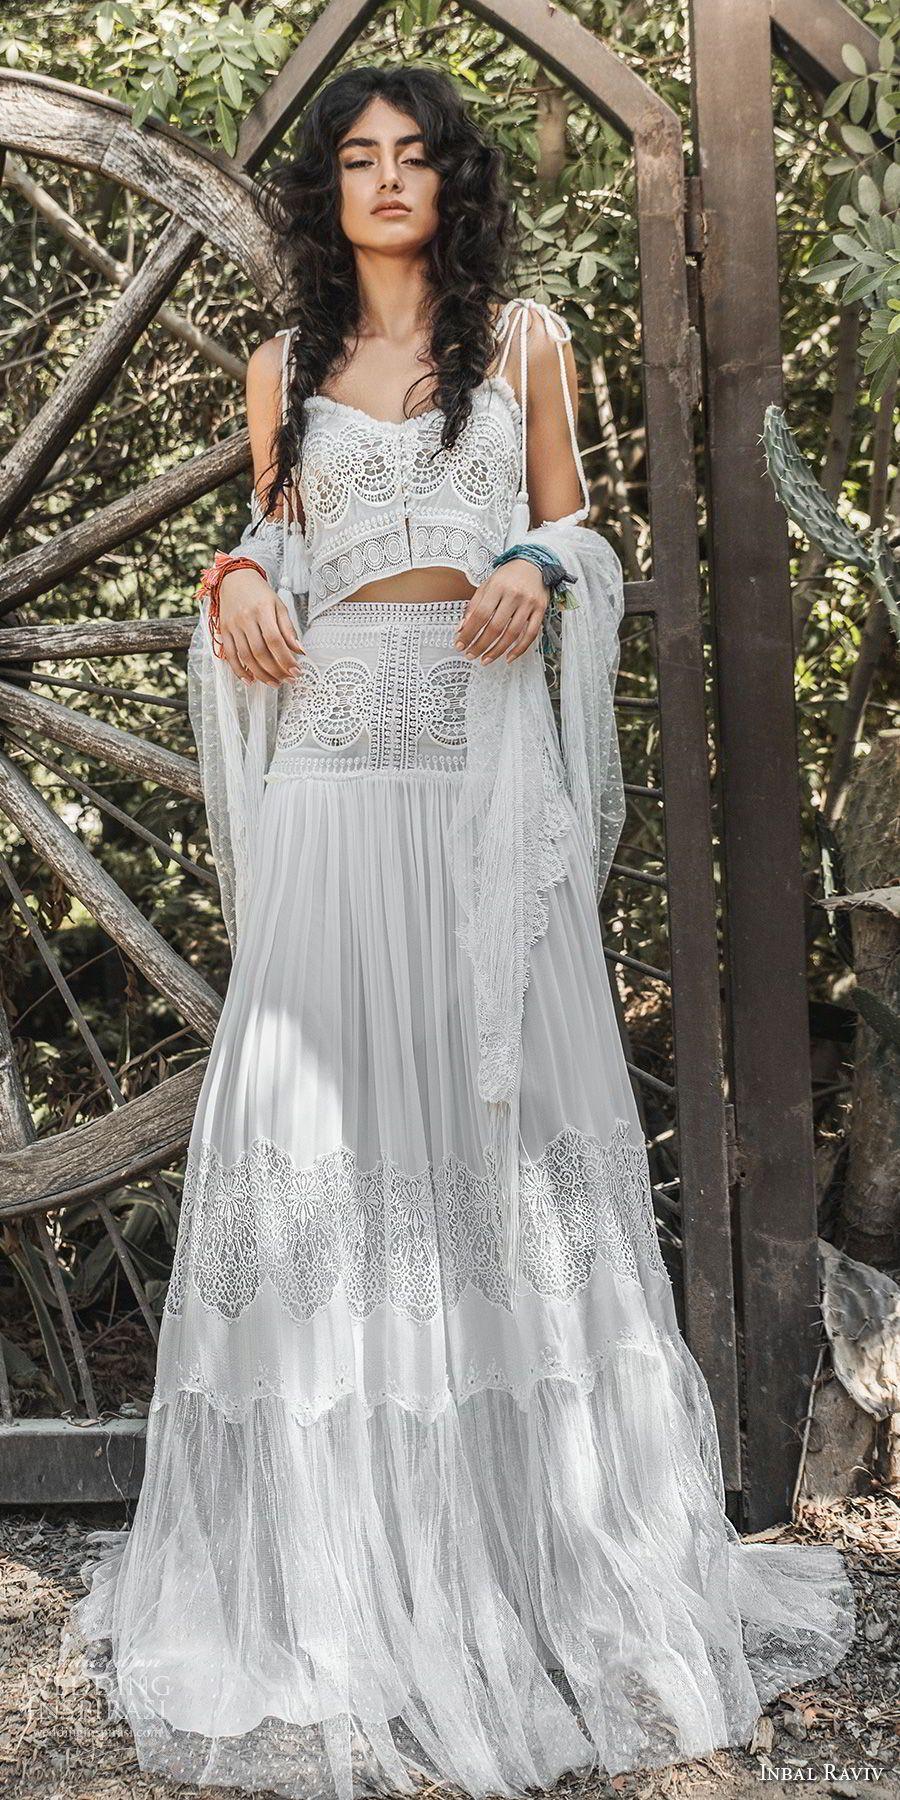 Inbal Raviv 2017 Wedding Dresses | Wedding Inspira